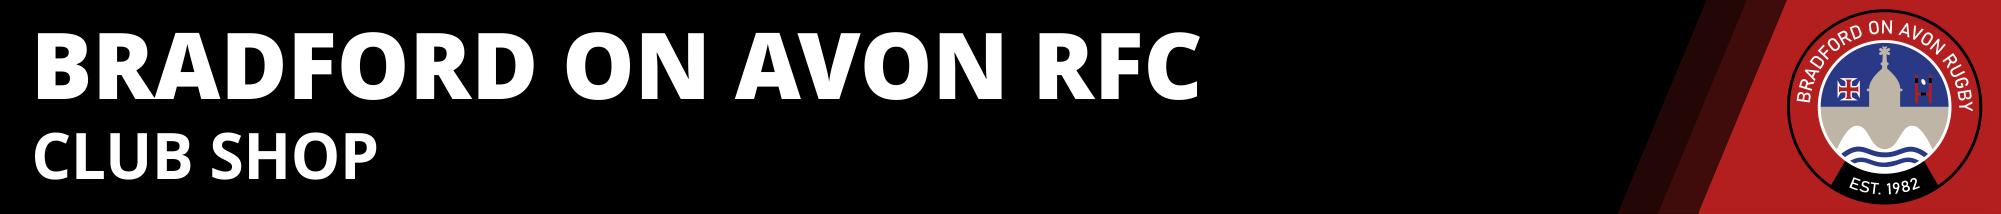 bradford-on-avon-rfc-club-shop-badge.png